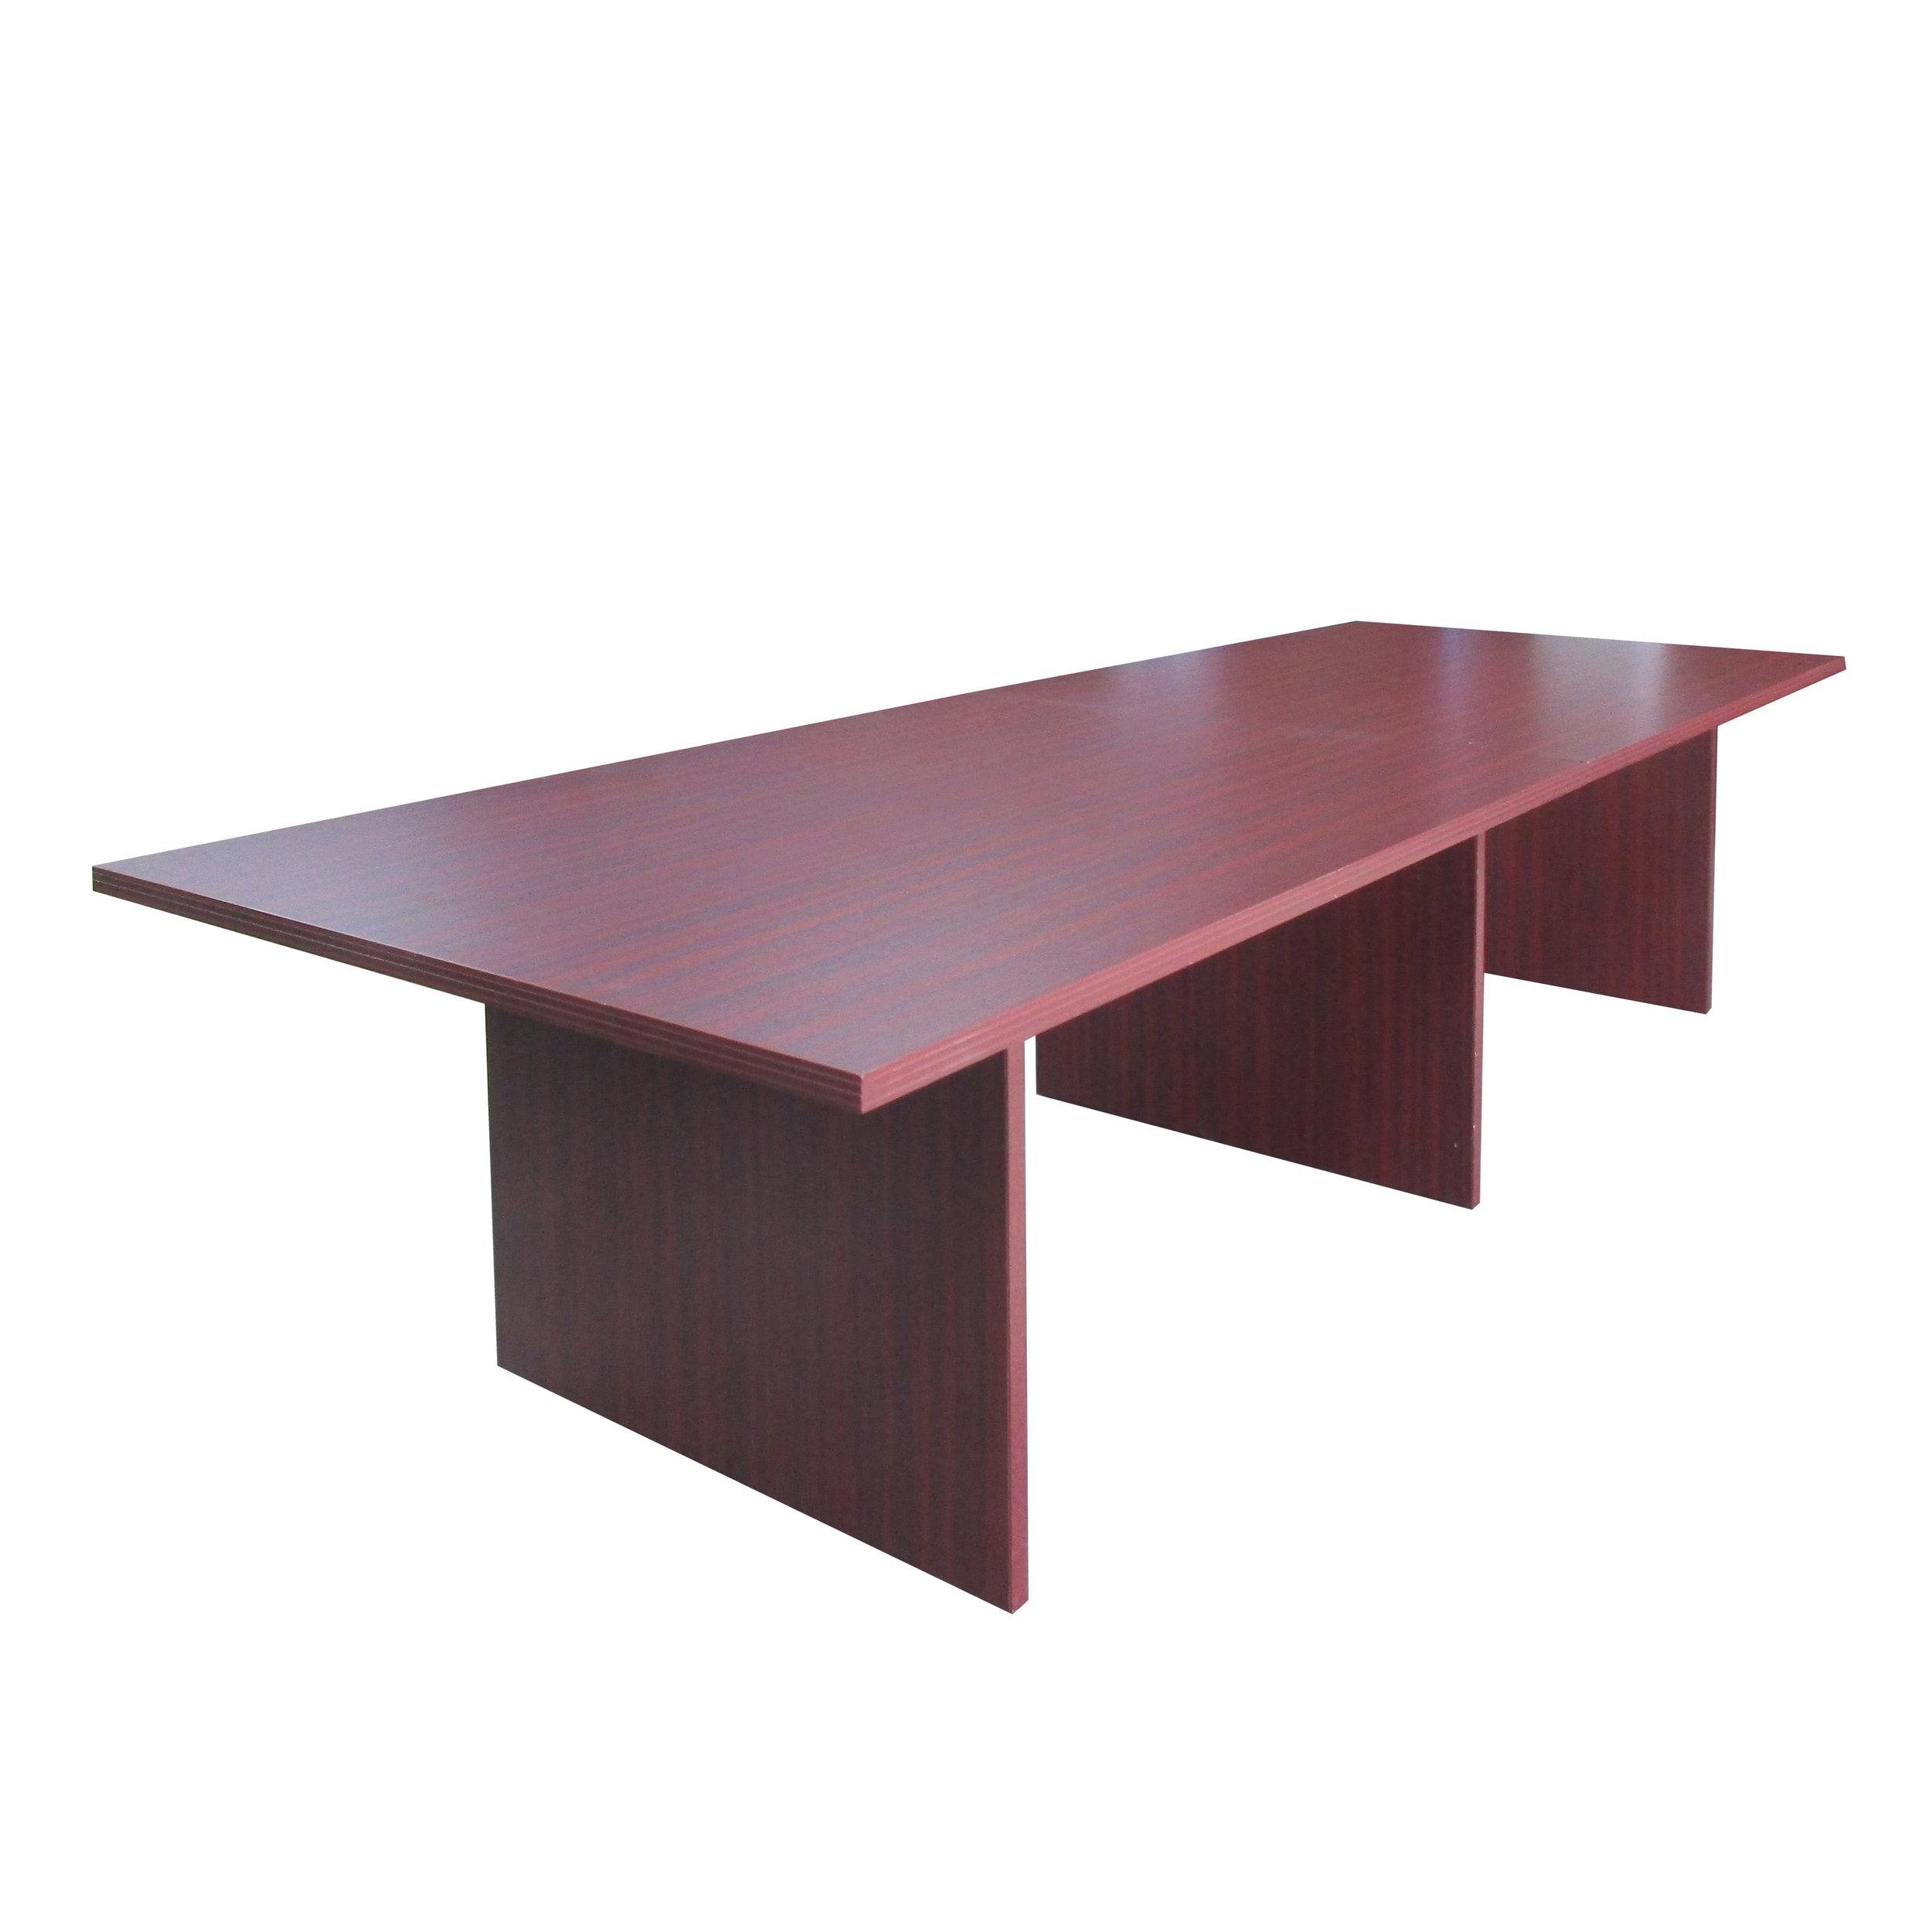 conf+table+15.jpg